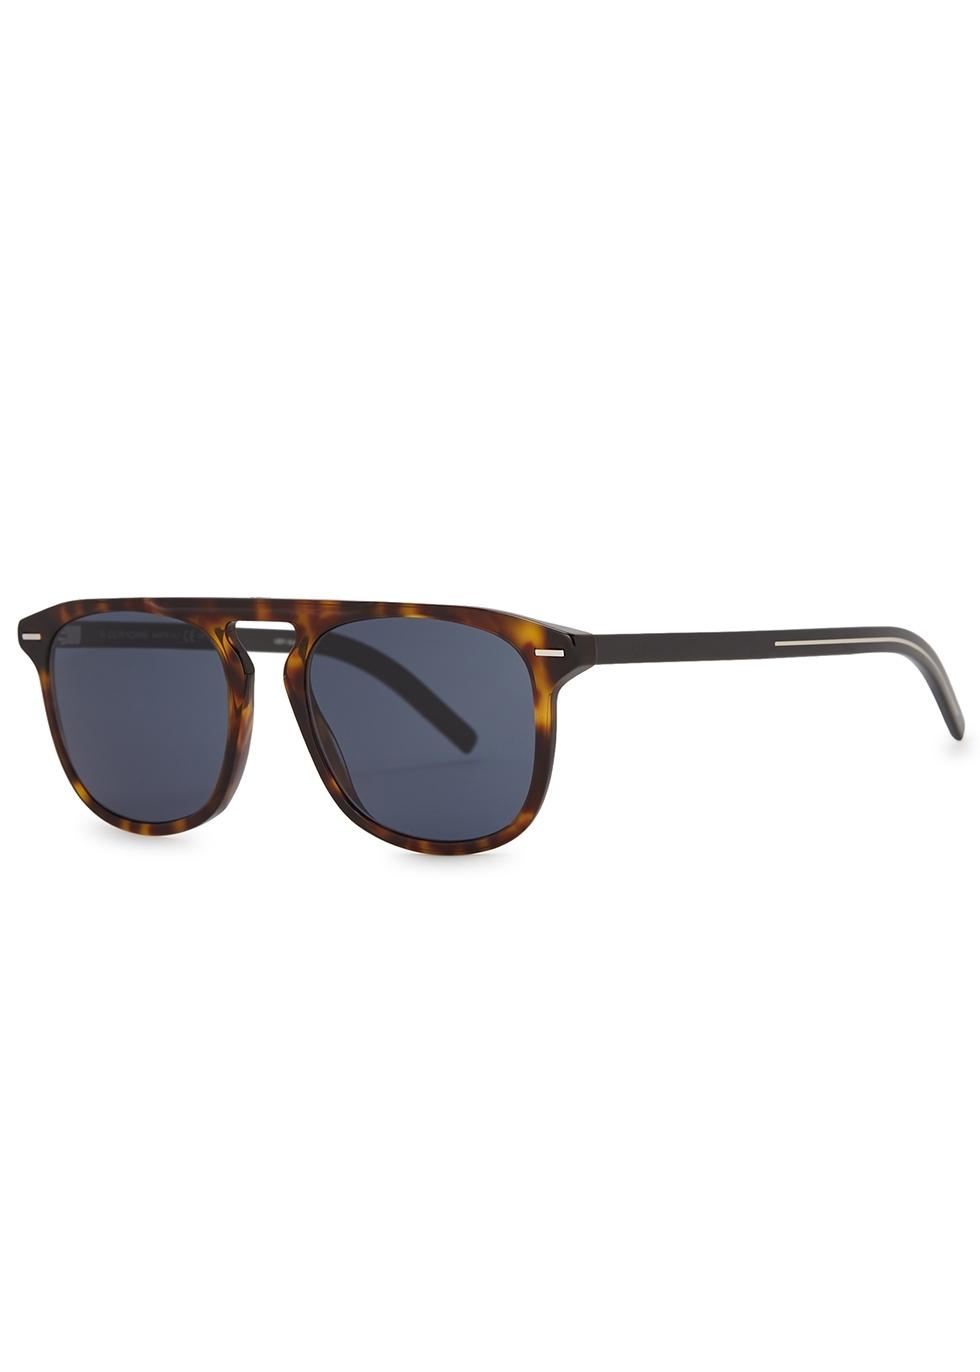 3ec9b153319 Men s Designer Sunglasses   Eyewear - Harvey Nichols